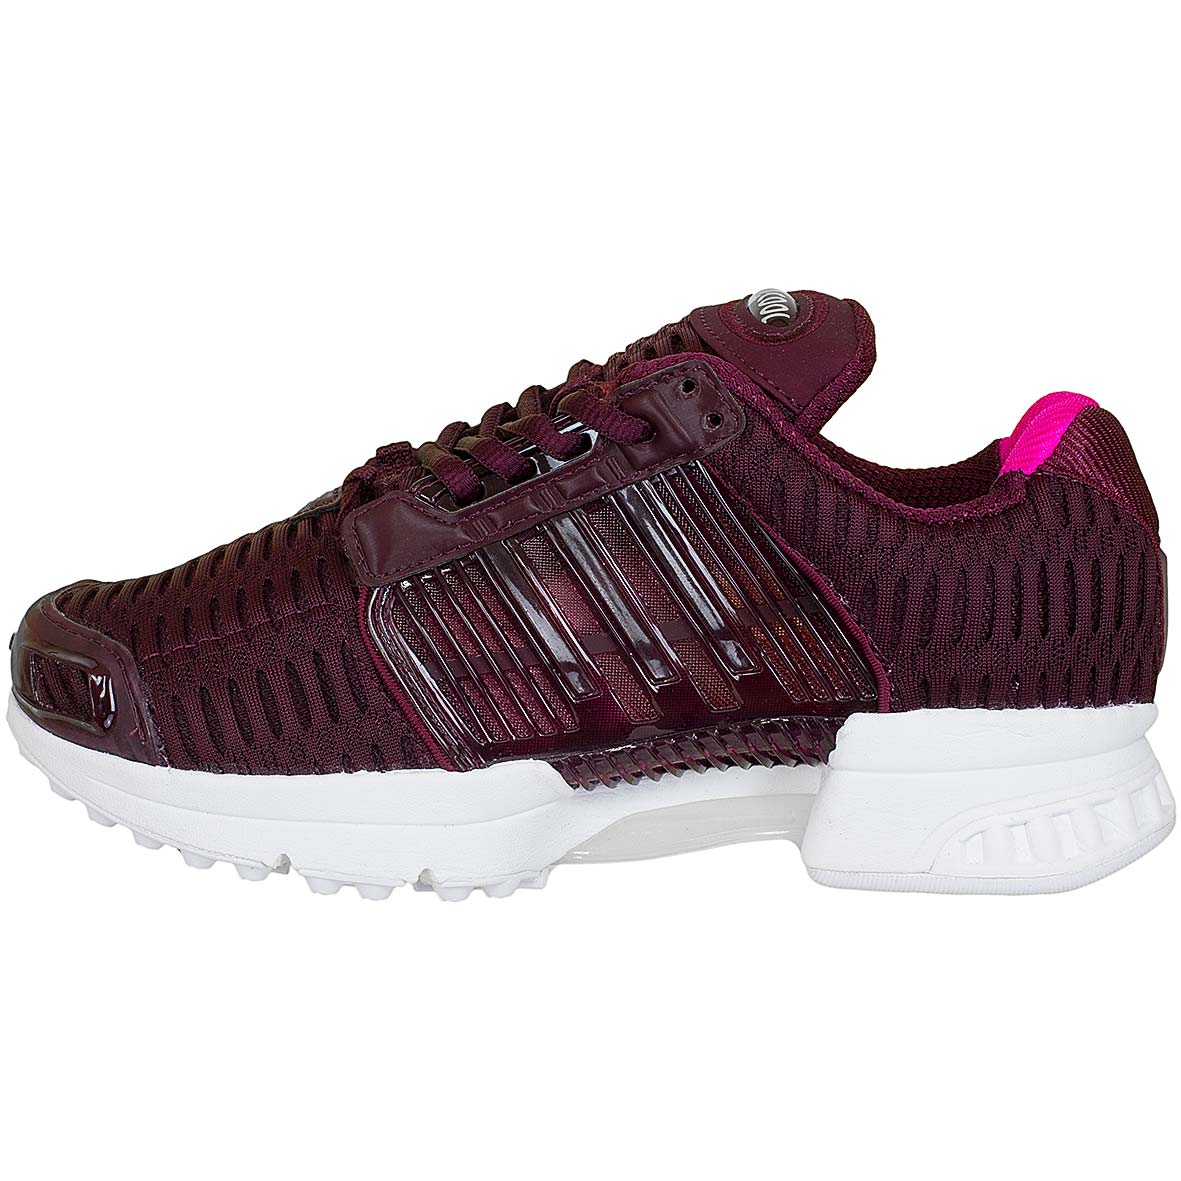 best deals on 620eb 1a9d9 Adidas Originals Damen Sneaker Clima Cool 1 maroon